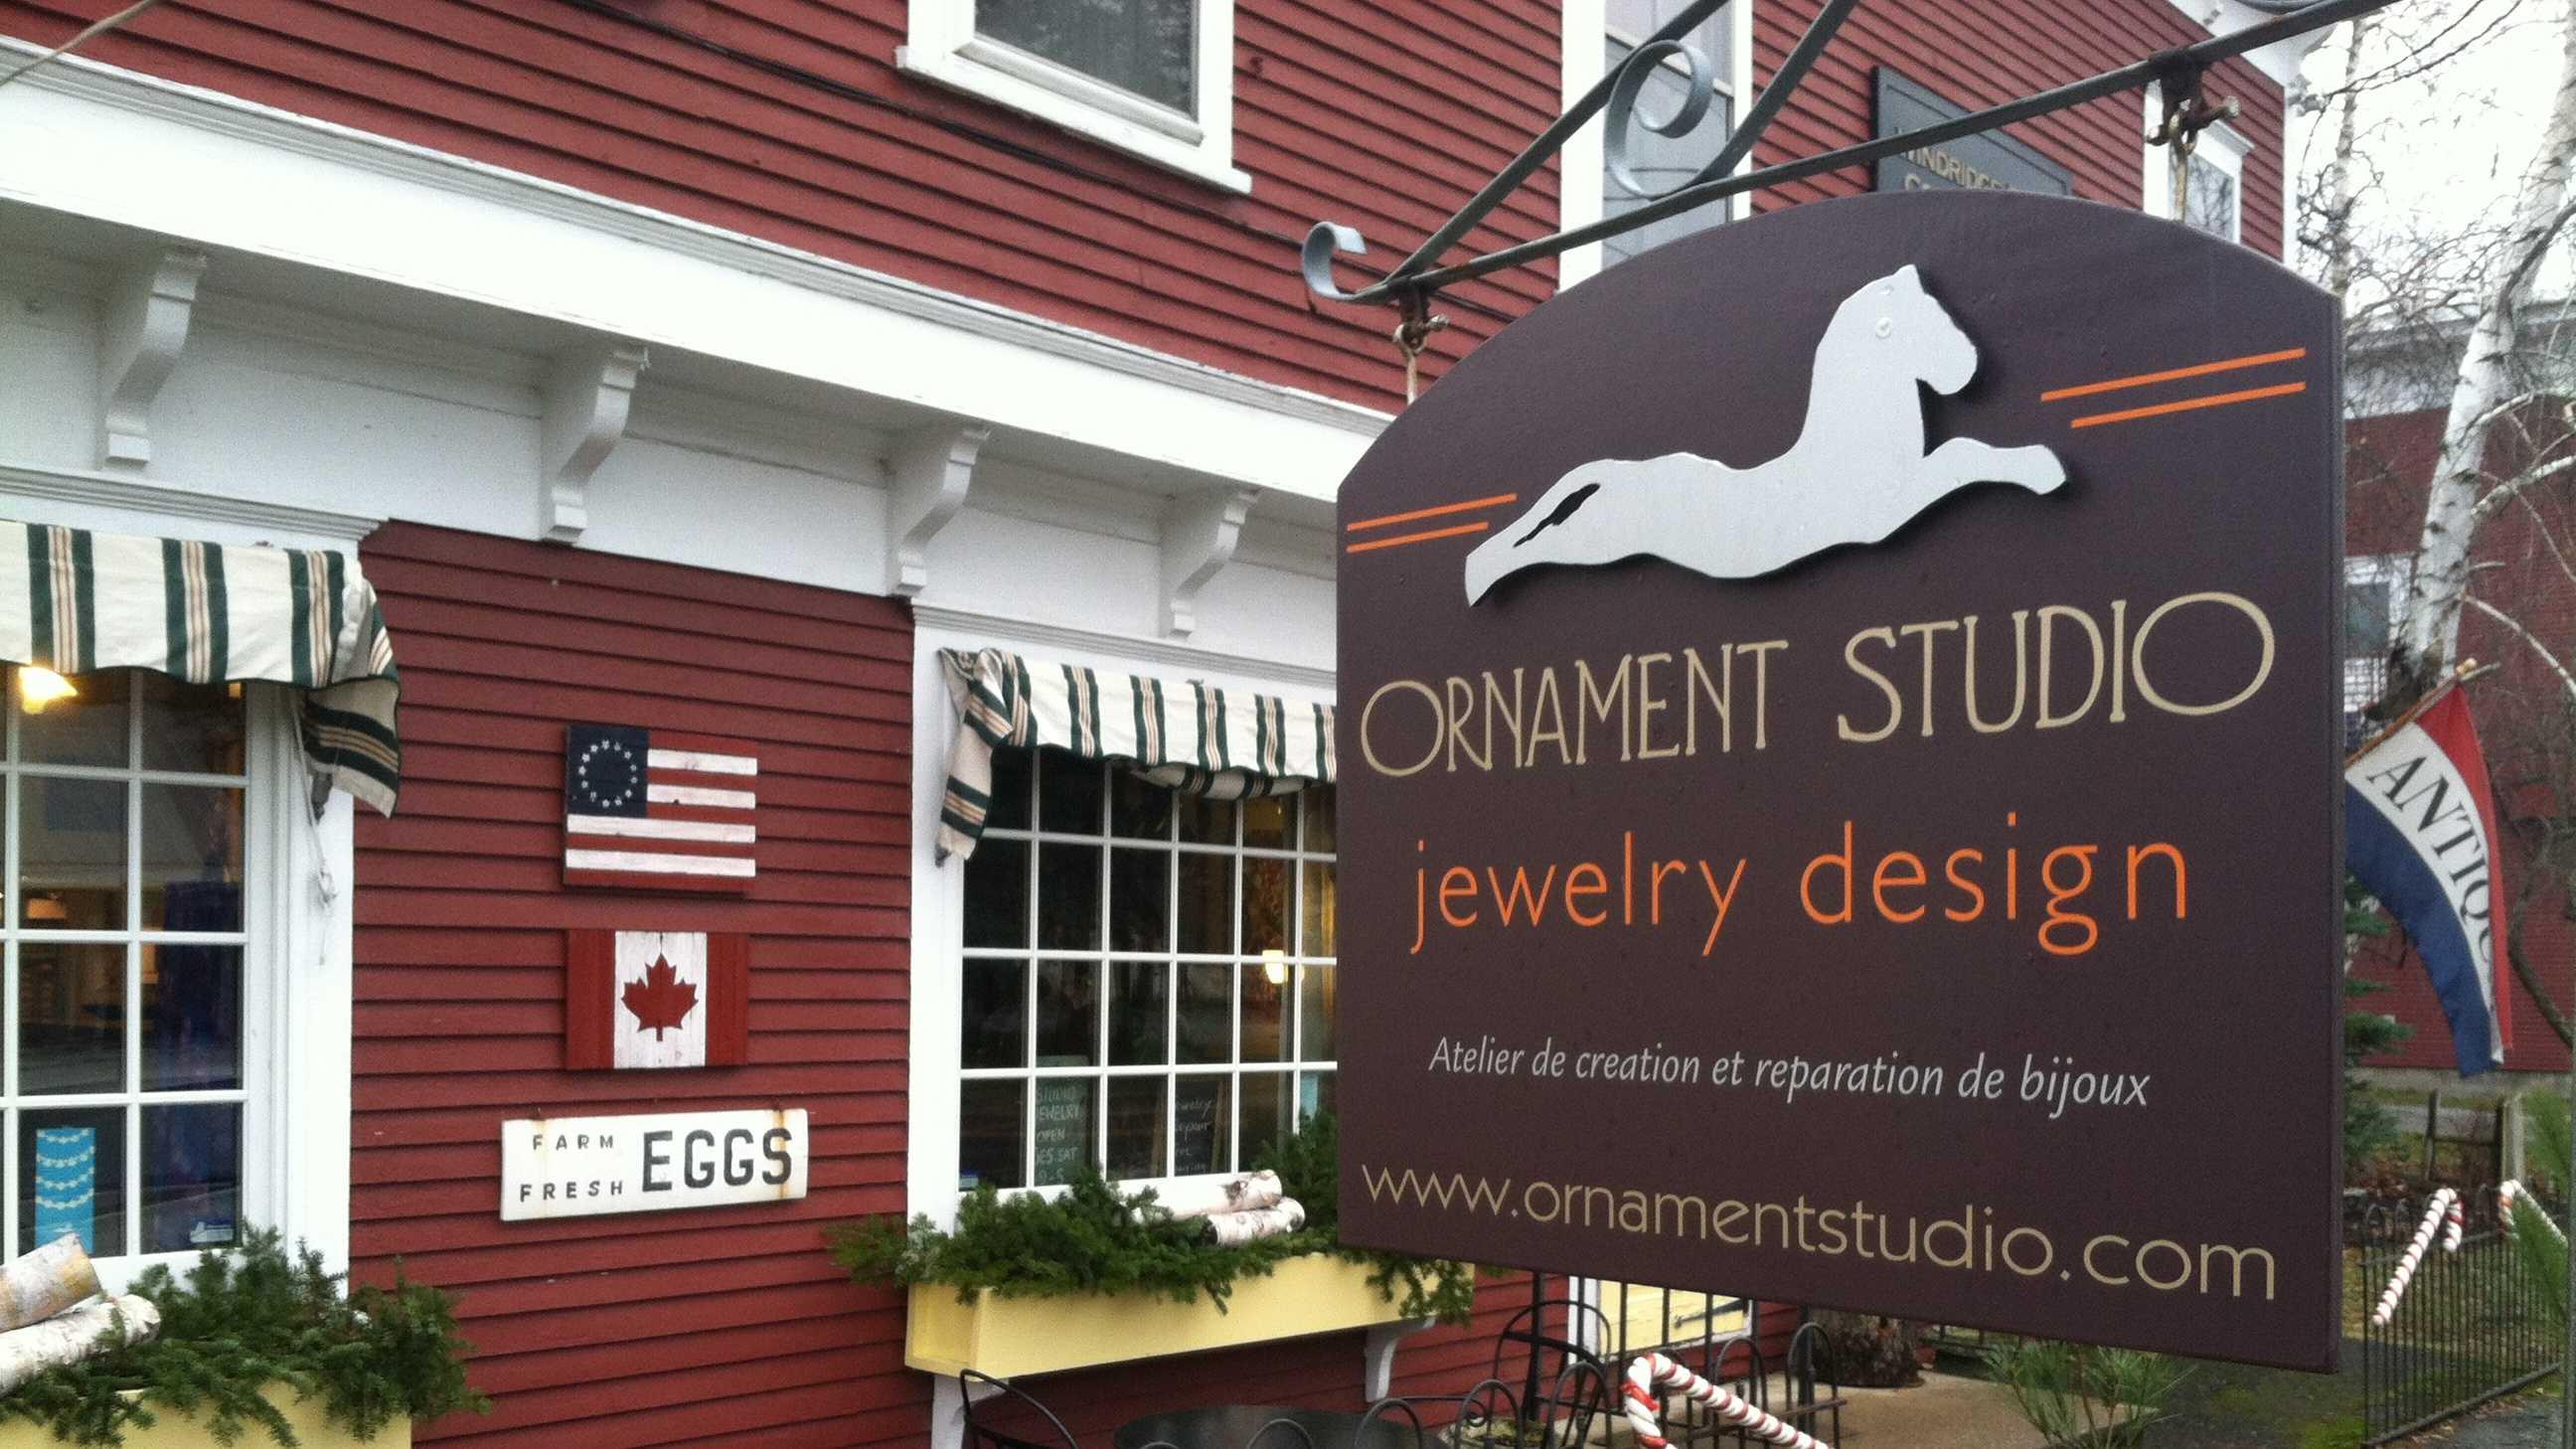 Ornament Studio